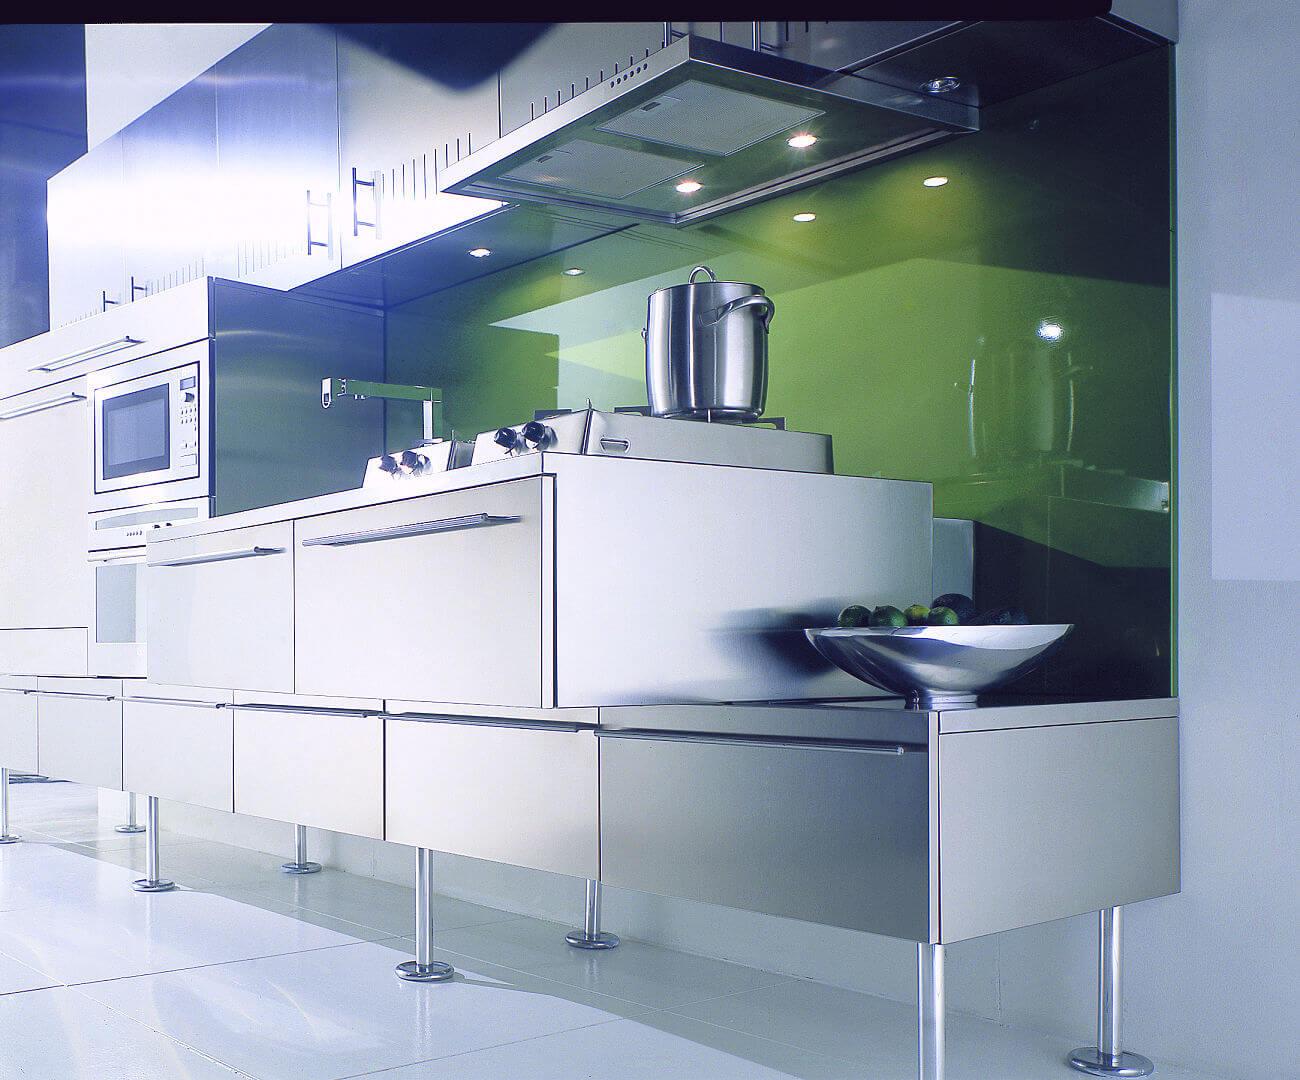 Arca Cucine Italy - Kitchen Stainless Steel Customized - Feet